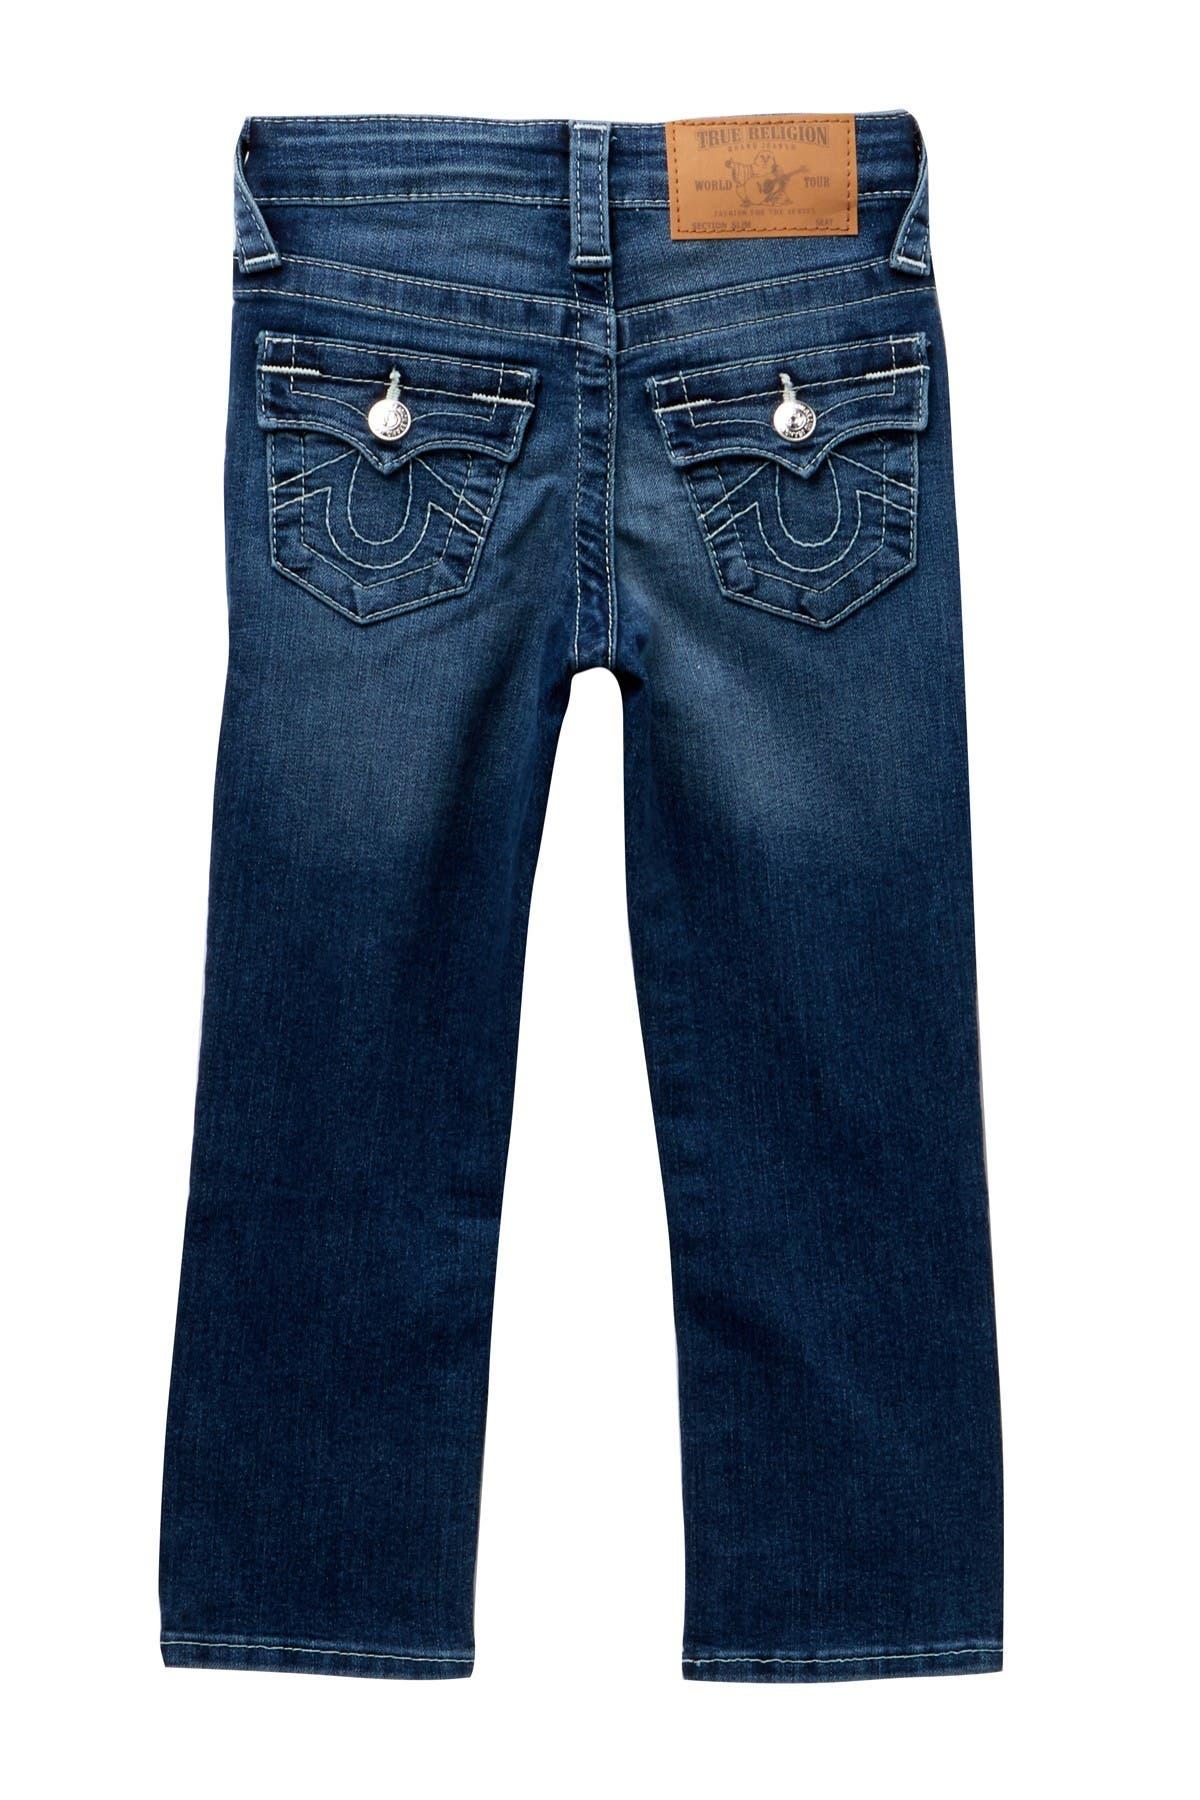 Image of True Religion Slim S.E Pants